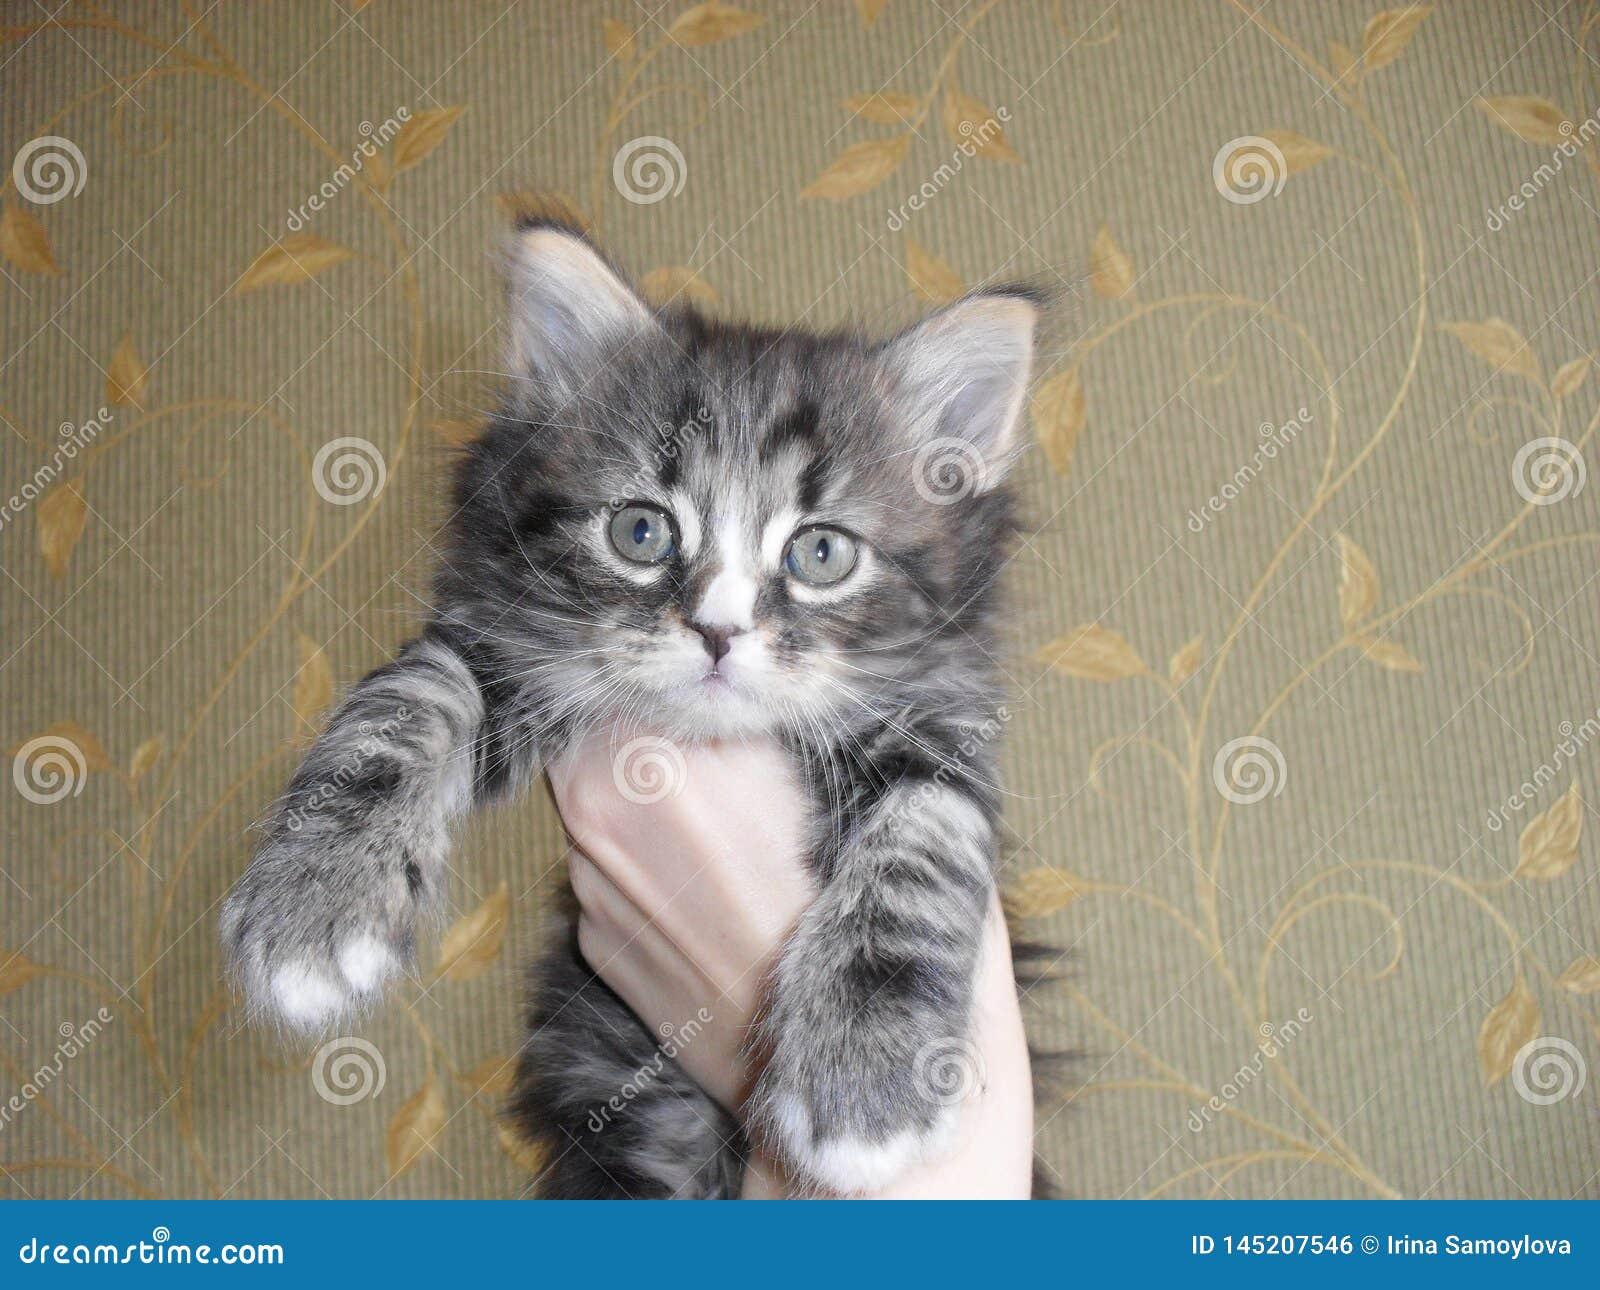 Cute little striped gray fluffy kitten adorable